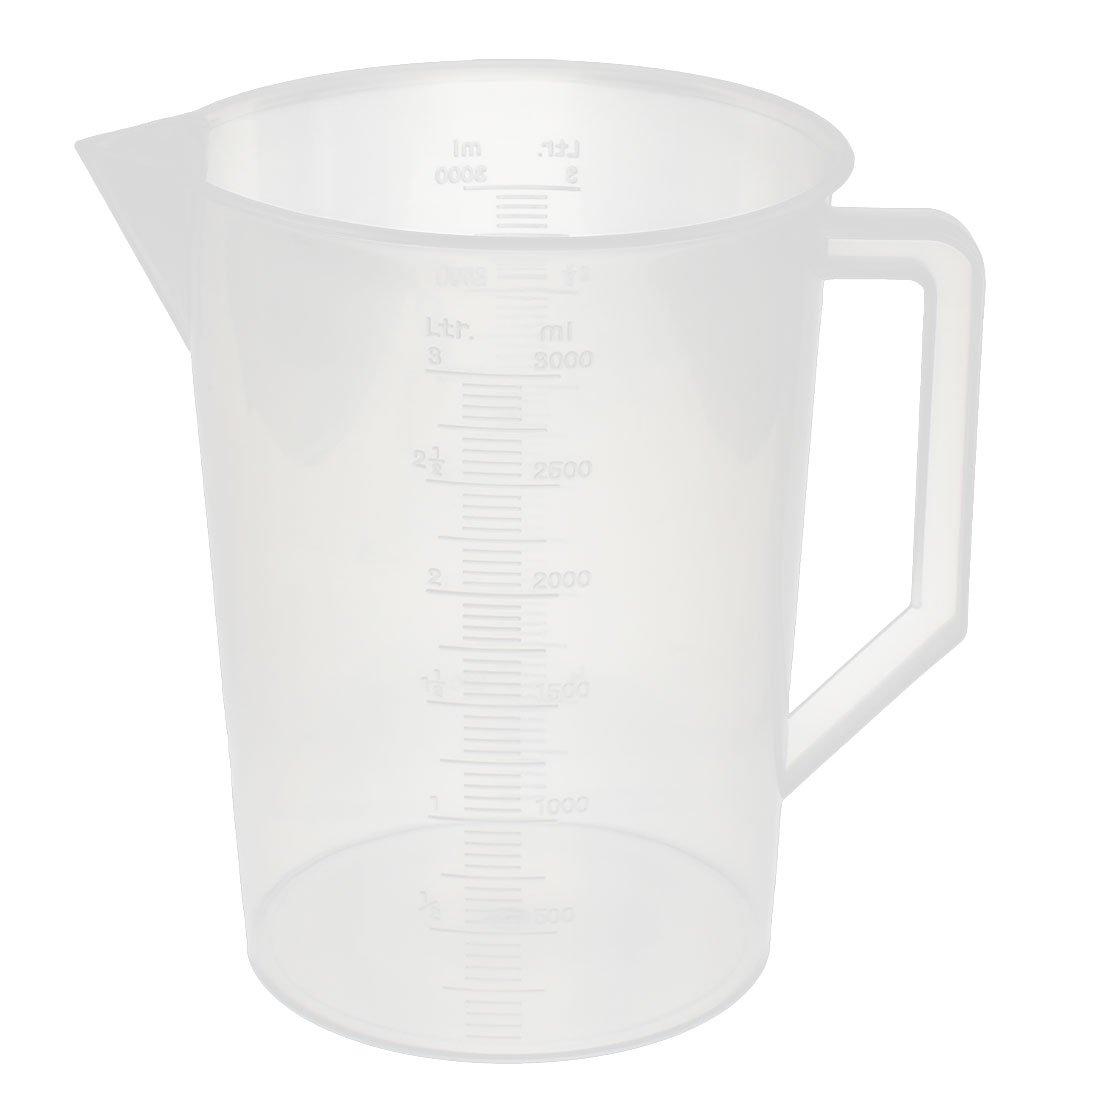 uxcell/® Kitchen Labotary 3000ml Plastic Measuring Cup Jug Pour Spout Container